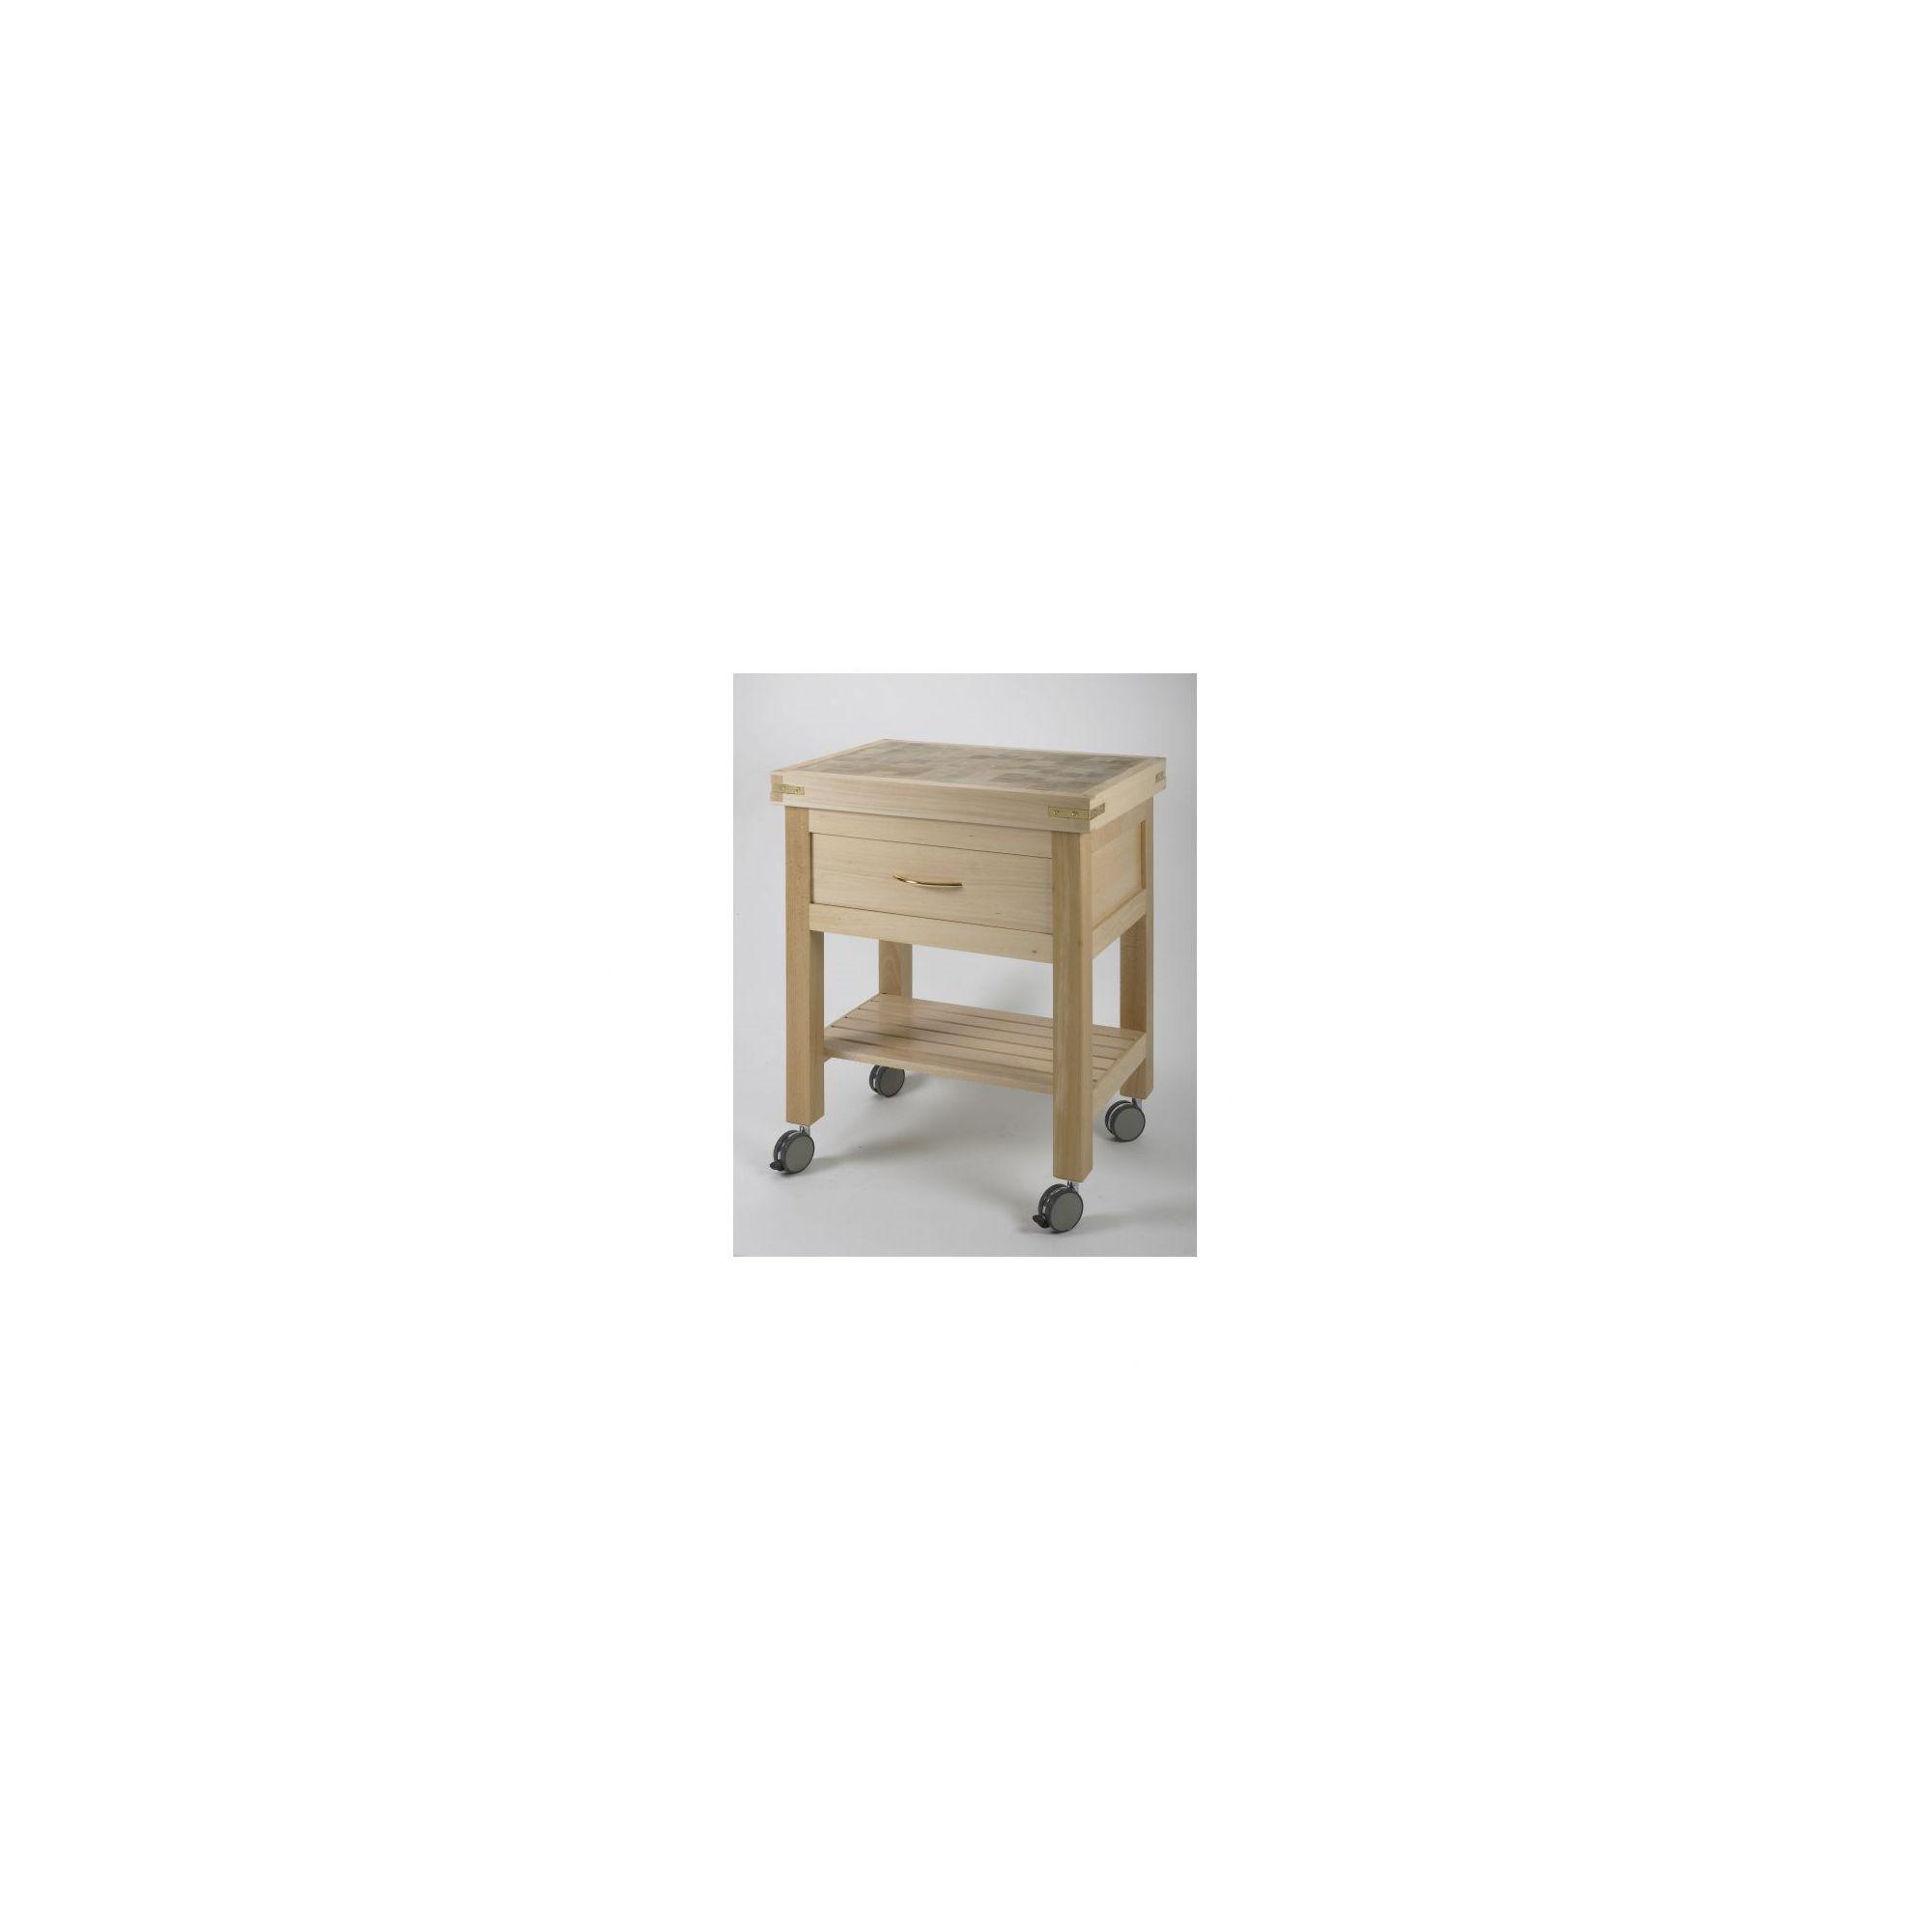 Chabret Kitchen Cart - 85cm X 70cm X 50cm at Tesco Direct